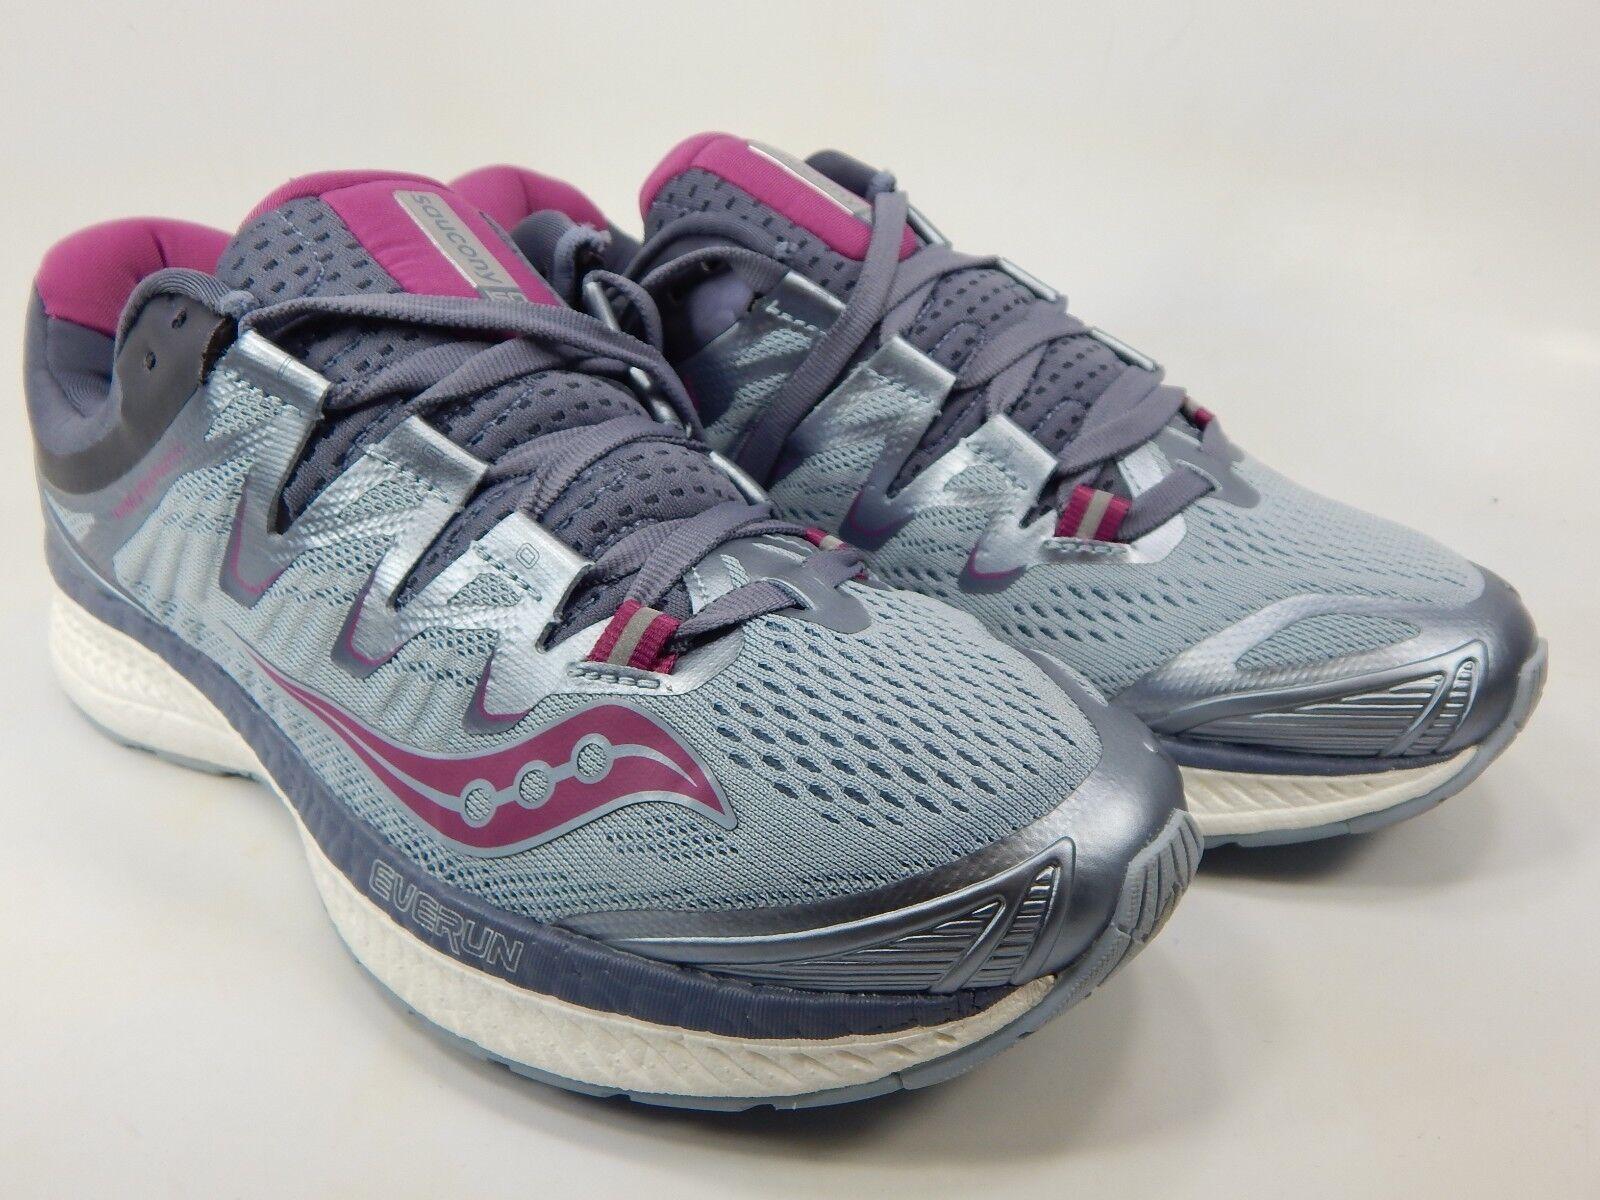 Saucony Triumph ISO 4 Size US 8 M (B) EU 39 Women's Running Shoes Gray S10413 1